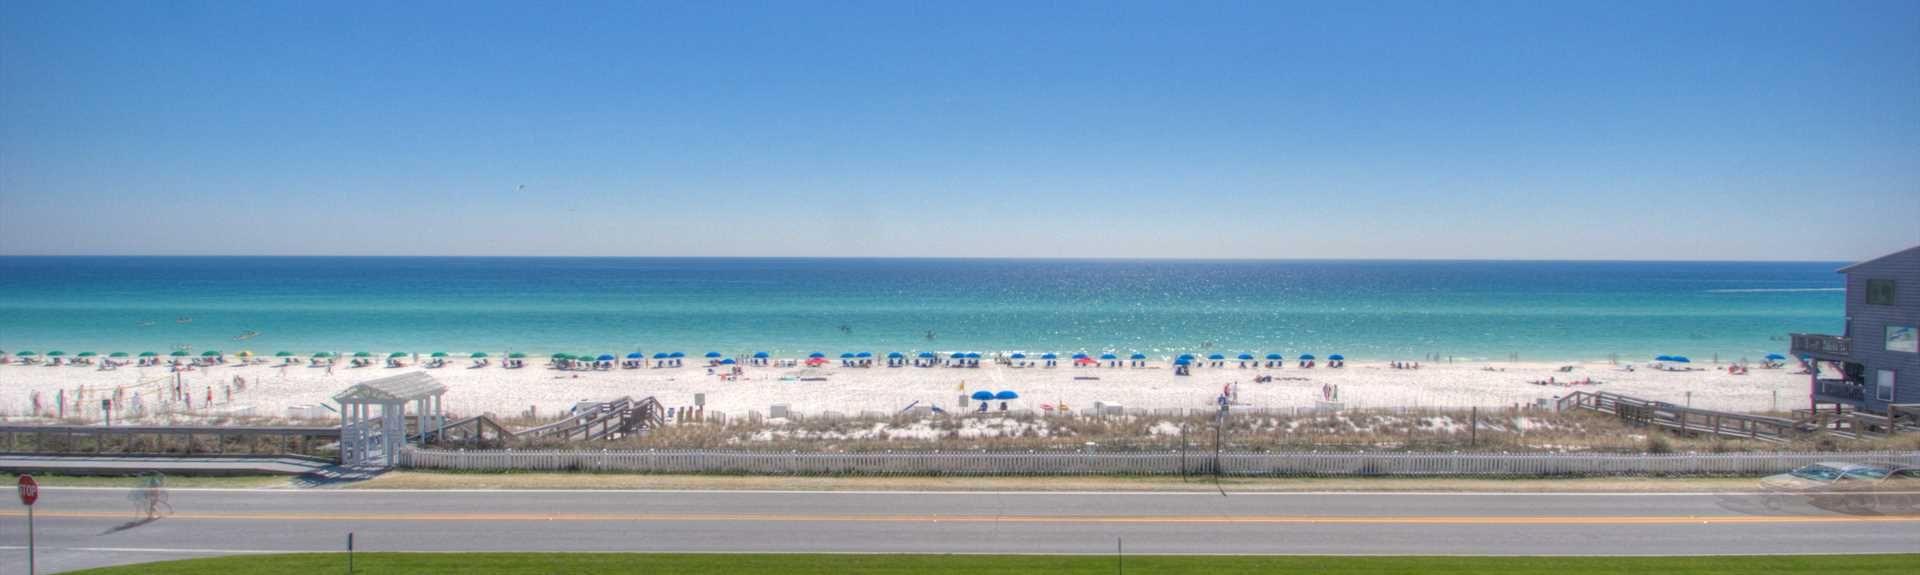 Vrbo | Avalon Beach Estates, Miramar Beach Vacation Rentals